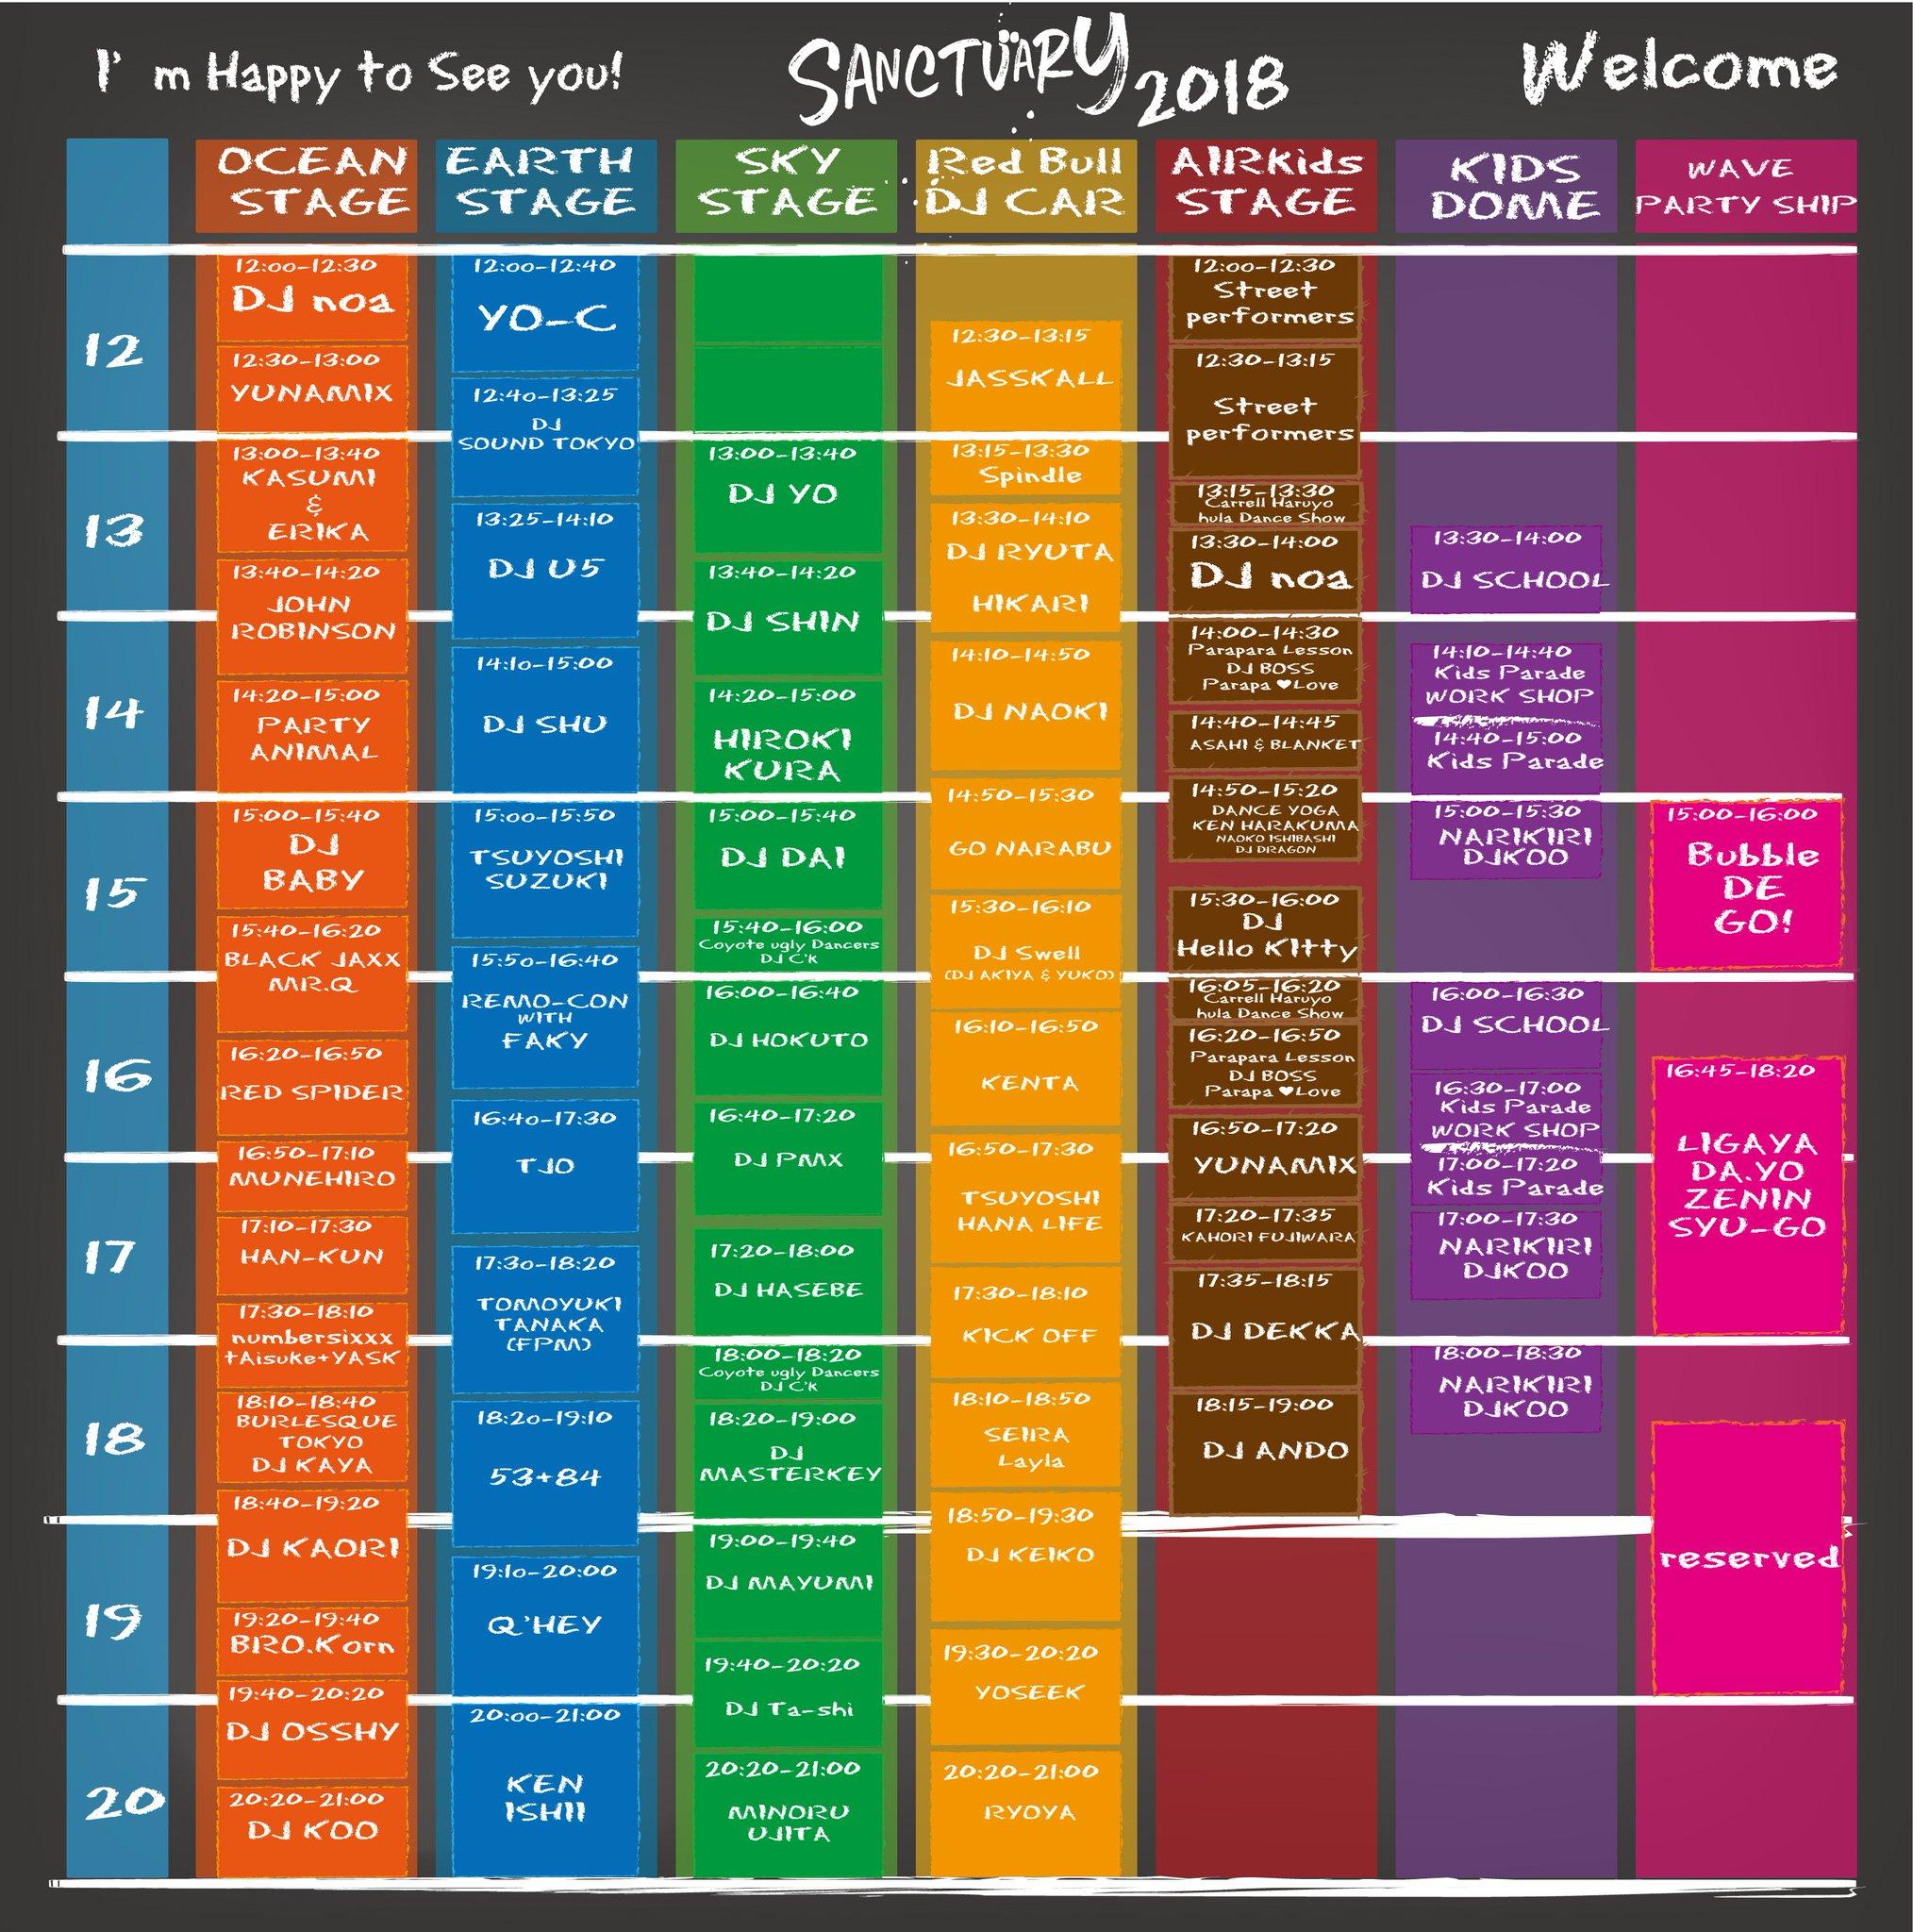 DJ KOO、DJ OSSHY、Bro.KORNなどが出演するディスコ、ライブ、ダンスステージ<br /><br>12:00-12:30 DJ☆noa<br /><br>12:30-13:00 DJ YUNAMIX<br /><br>13:00-13:40 DJ KASUMI & ERIKA<br /><br>13:40-14:20 JOHN ROBINSON<br /><br>14:20-15:00 PARTY ANIMAL<br /><br>15:00-15:40 DJ BABY<br /><br>15:40-16:20 BLACK JAXX(武田真治+DJ DRAGON) & Mr.Q<br /><br>16:20-16:50 RED SPIDER<br /><br>16:50-17:10 MUNEHIRO<br /><br>17:10-17:30 HAN-KUN(湘南乃風)<br /><br>17:30-18:10 numbersixxx (tAisuke&YASK)<br /><br>18:10-18:40 BURLESQUE TOKYO & DJ KAYA<br /><br>18:40-19:20 DJ KAORI<br /><br>19:20-19:40 Bro.KORN<br /><br>19:40-20:20 DJ OSSHY<br /><br>20:20-21:00 DJ KOO